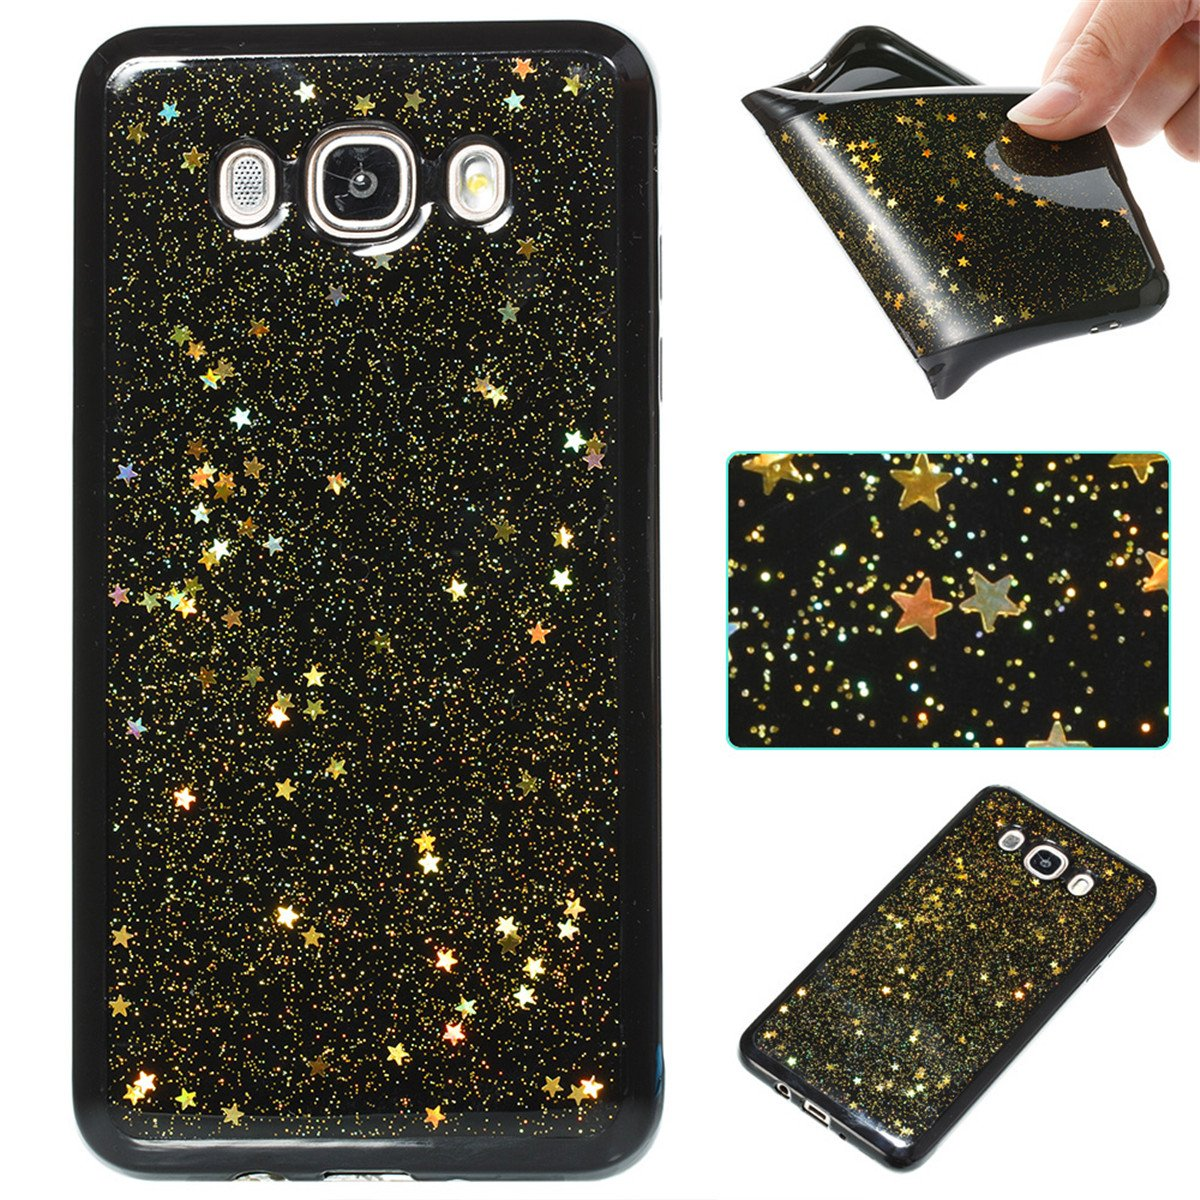 Samsung Galaxy J7 (2016) J710 Case Design Slim Slider Cover,Shock ...